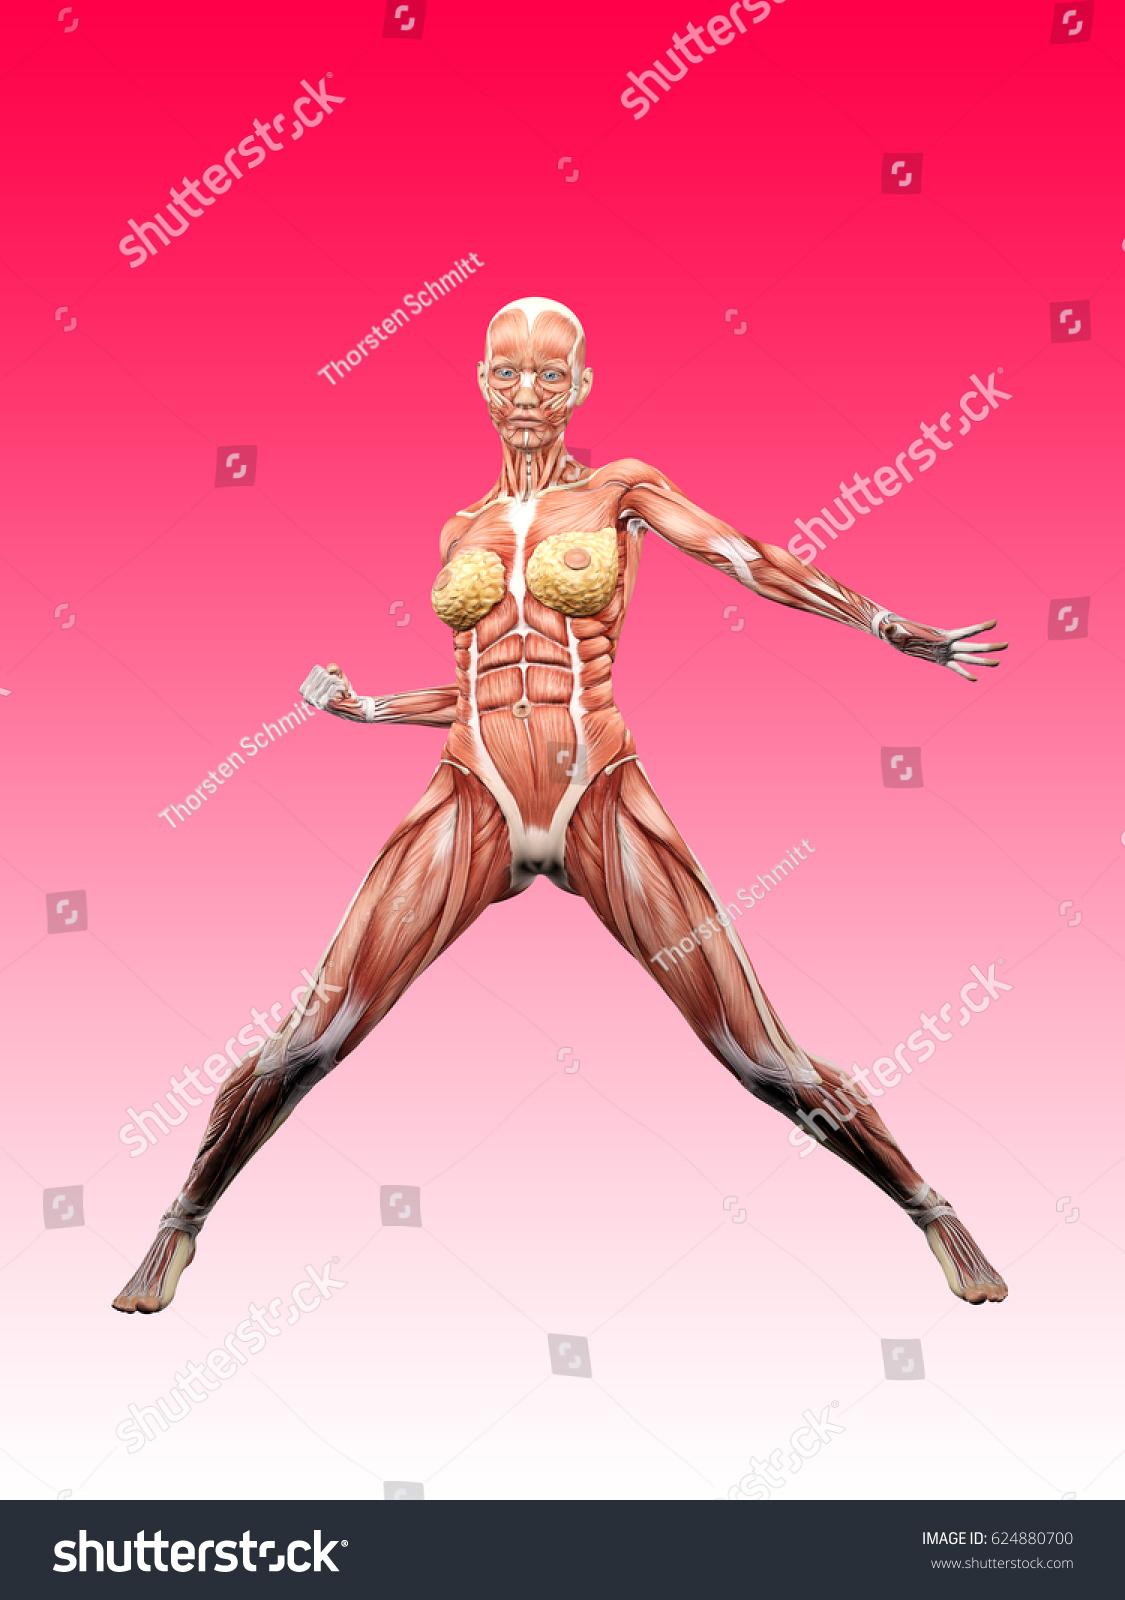 Female Muscle Anatomy Posing 3 D Illustration Stockillustration